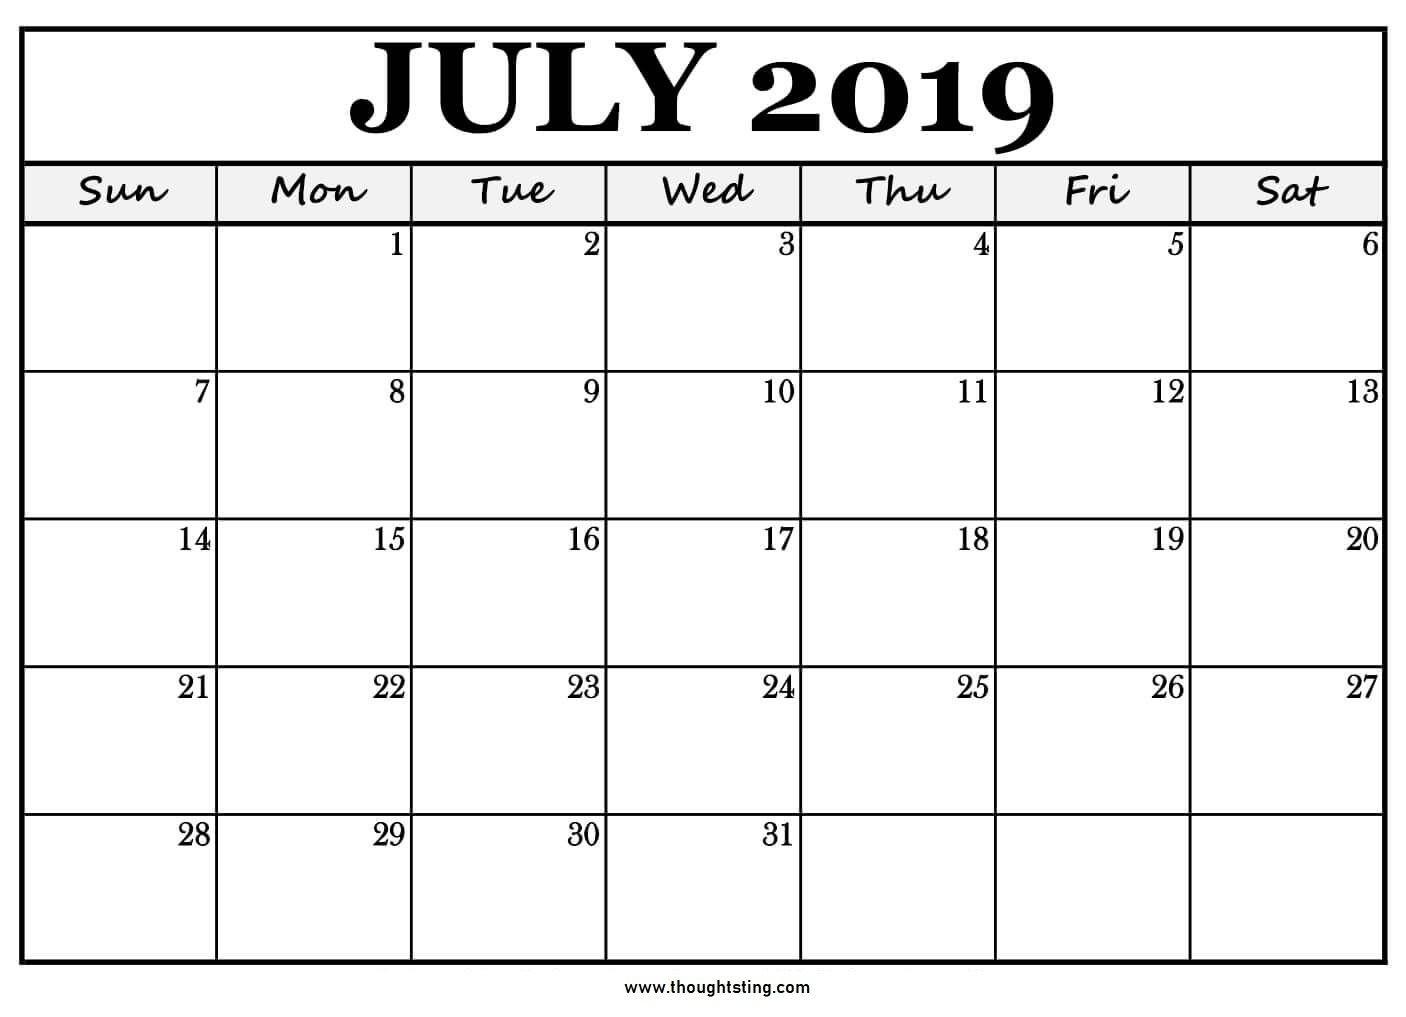 Free Printable Calendar Big Boxes   Ten Free Printable Calendar 2020-2021-2021 Yearly Calendar With Boxes